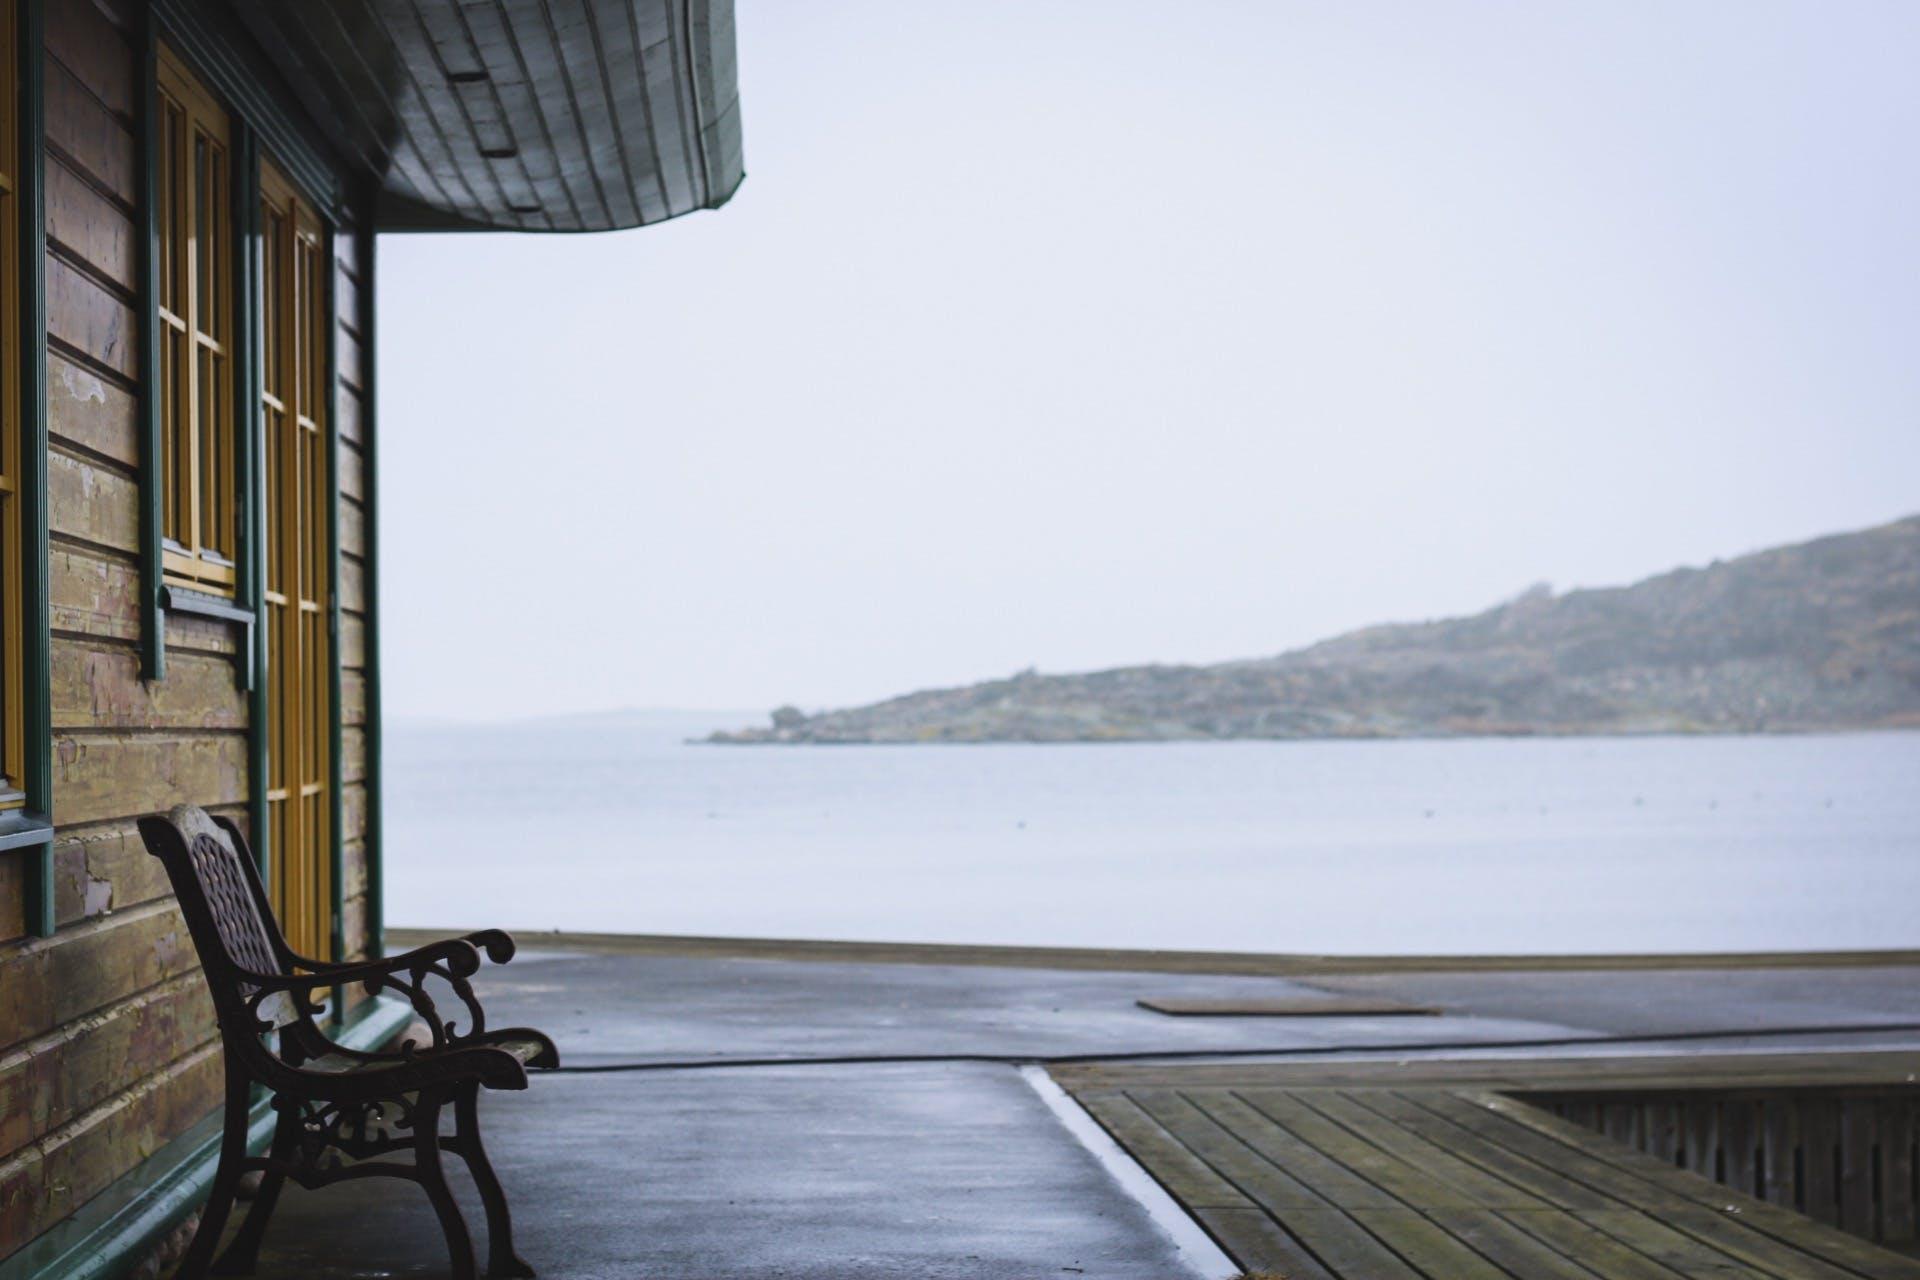 Free stock photo of bench, Forzen lake, house, lake